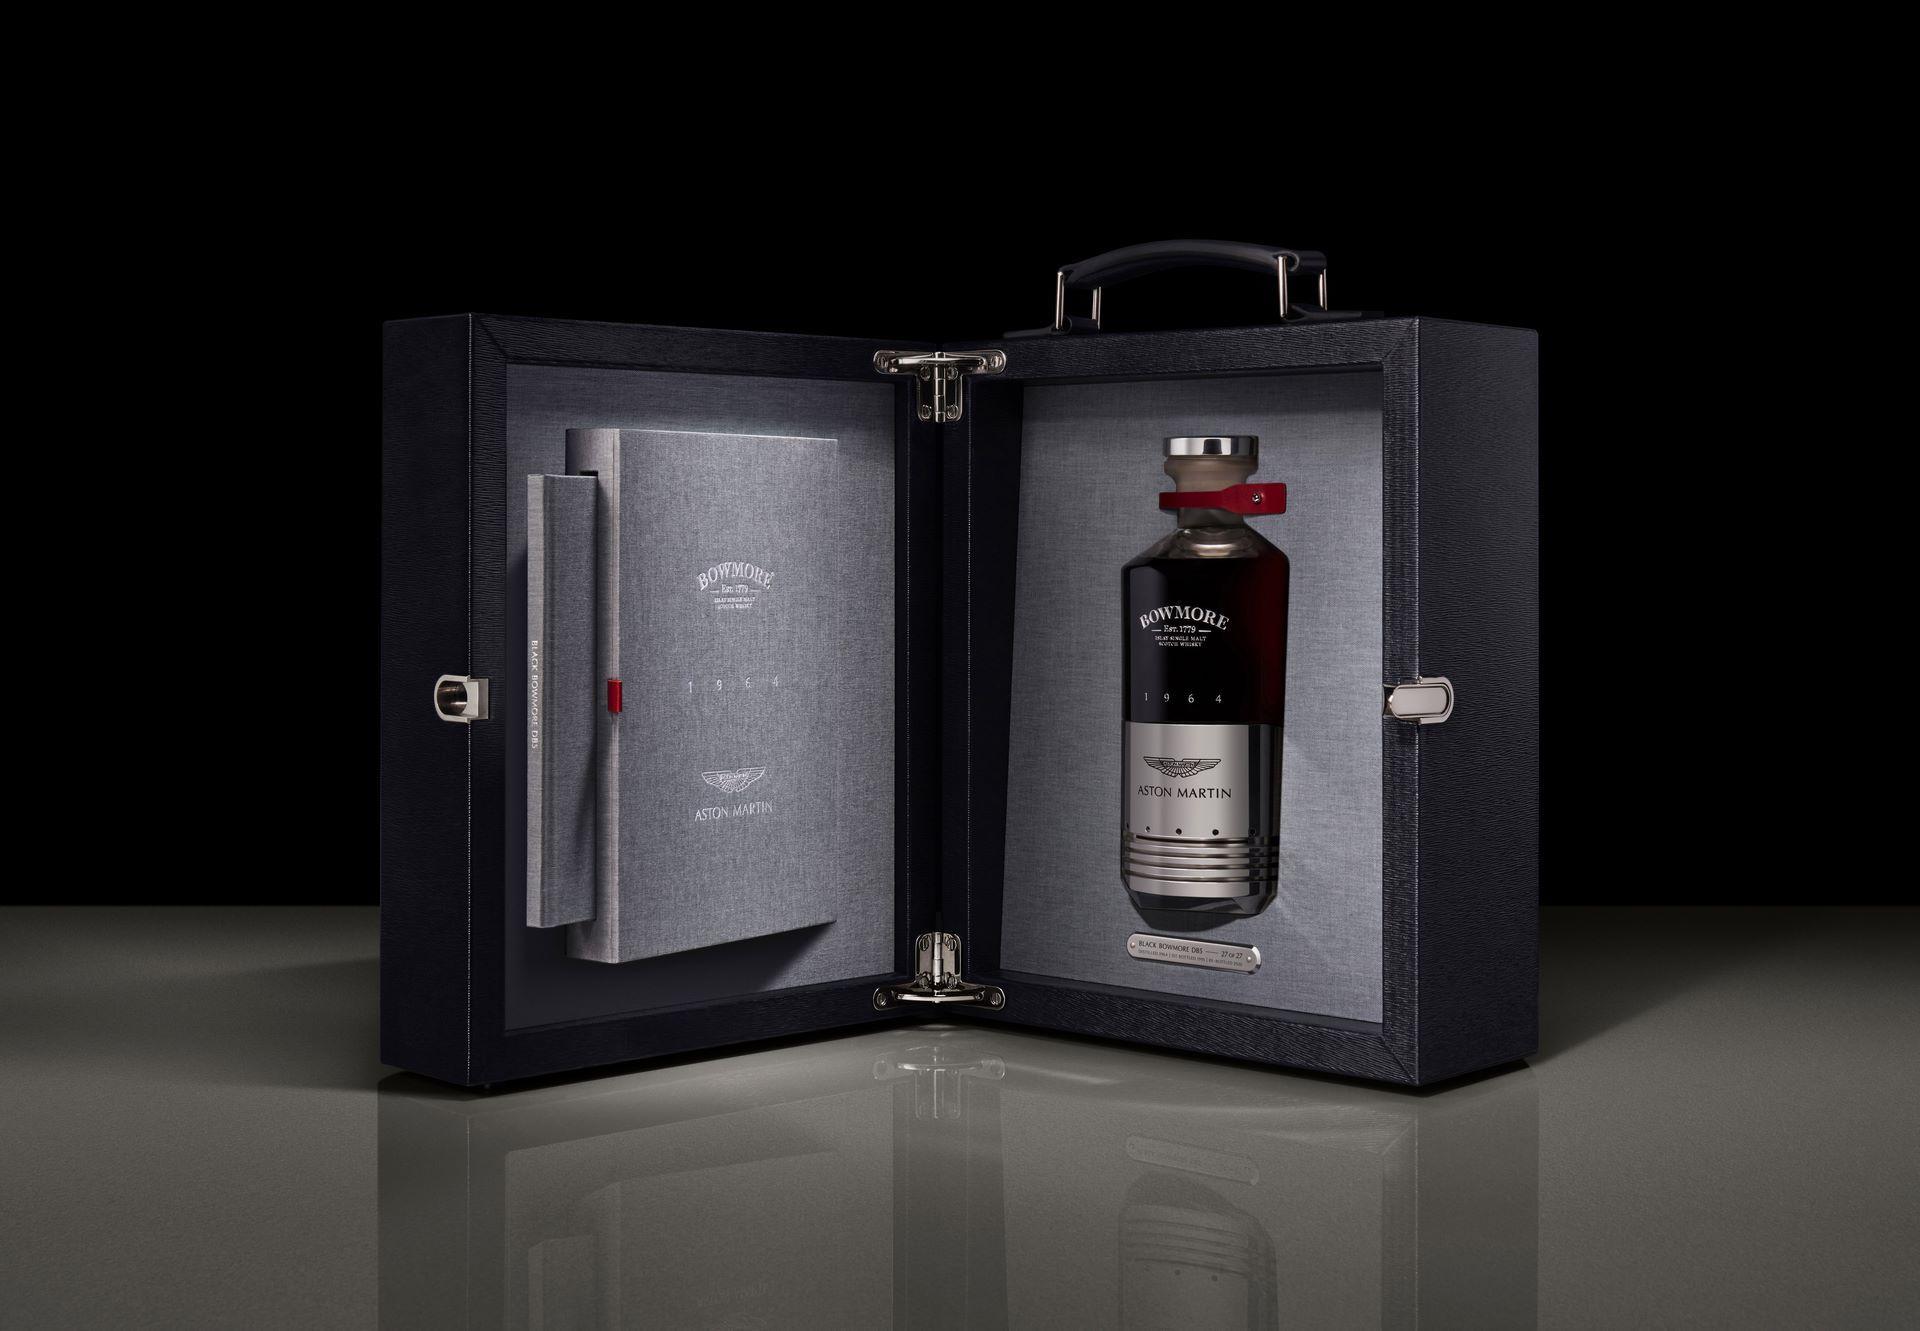 Black-Bowmore-Aston-Martin-DB5-1964-Whisky-2